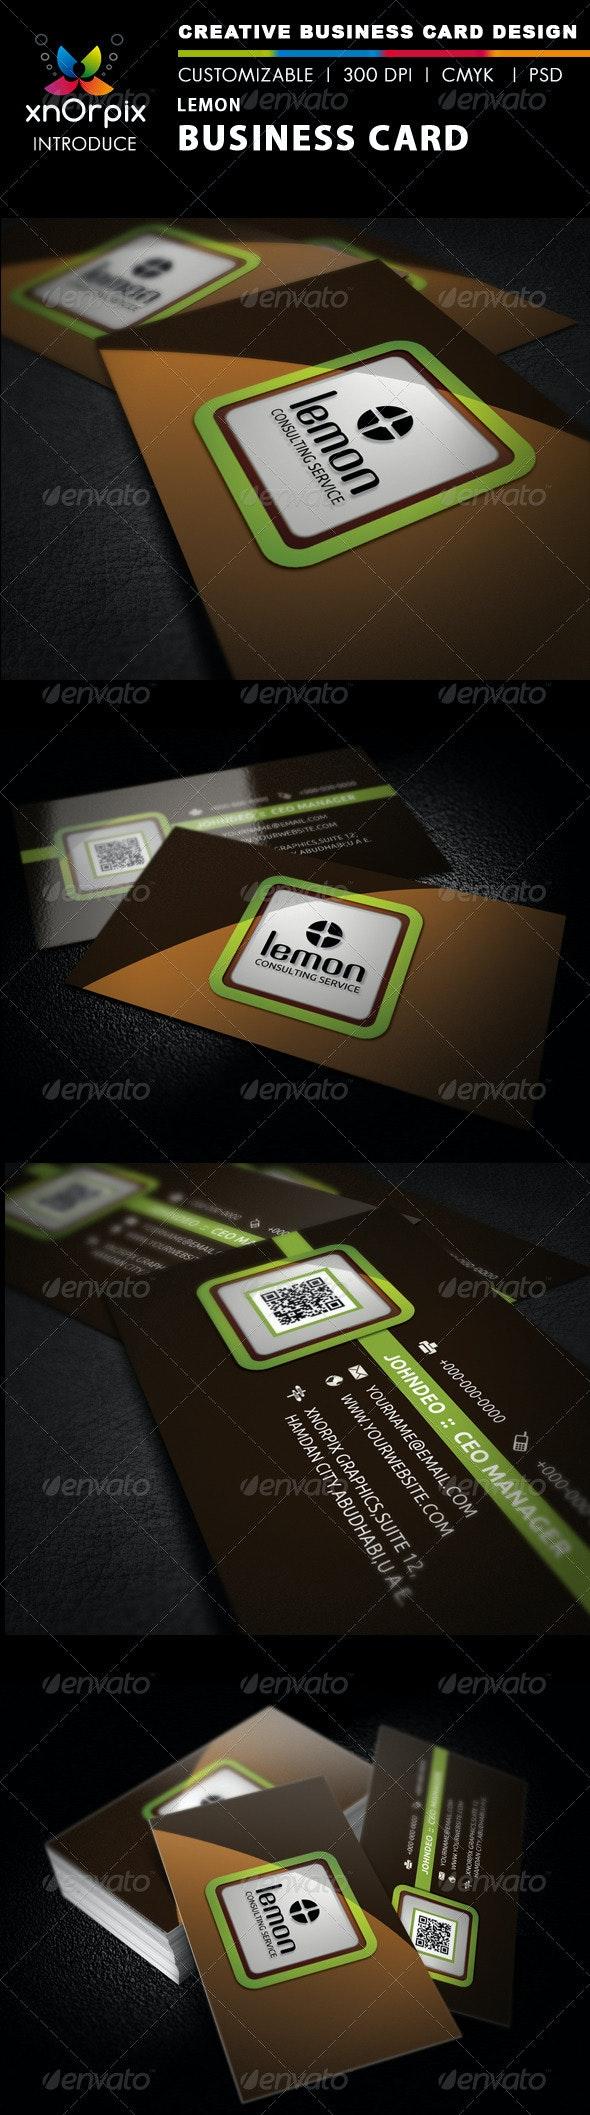 Lemon Business Card - Business Cards Print Templates